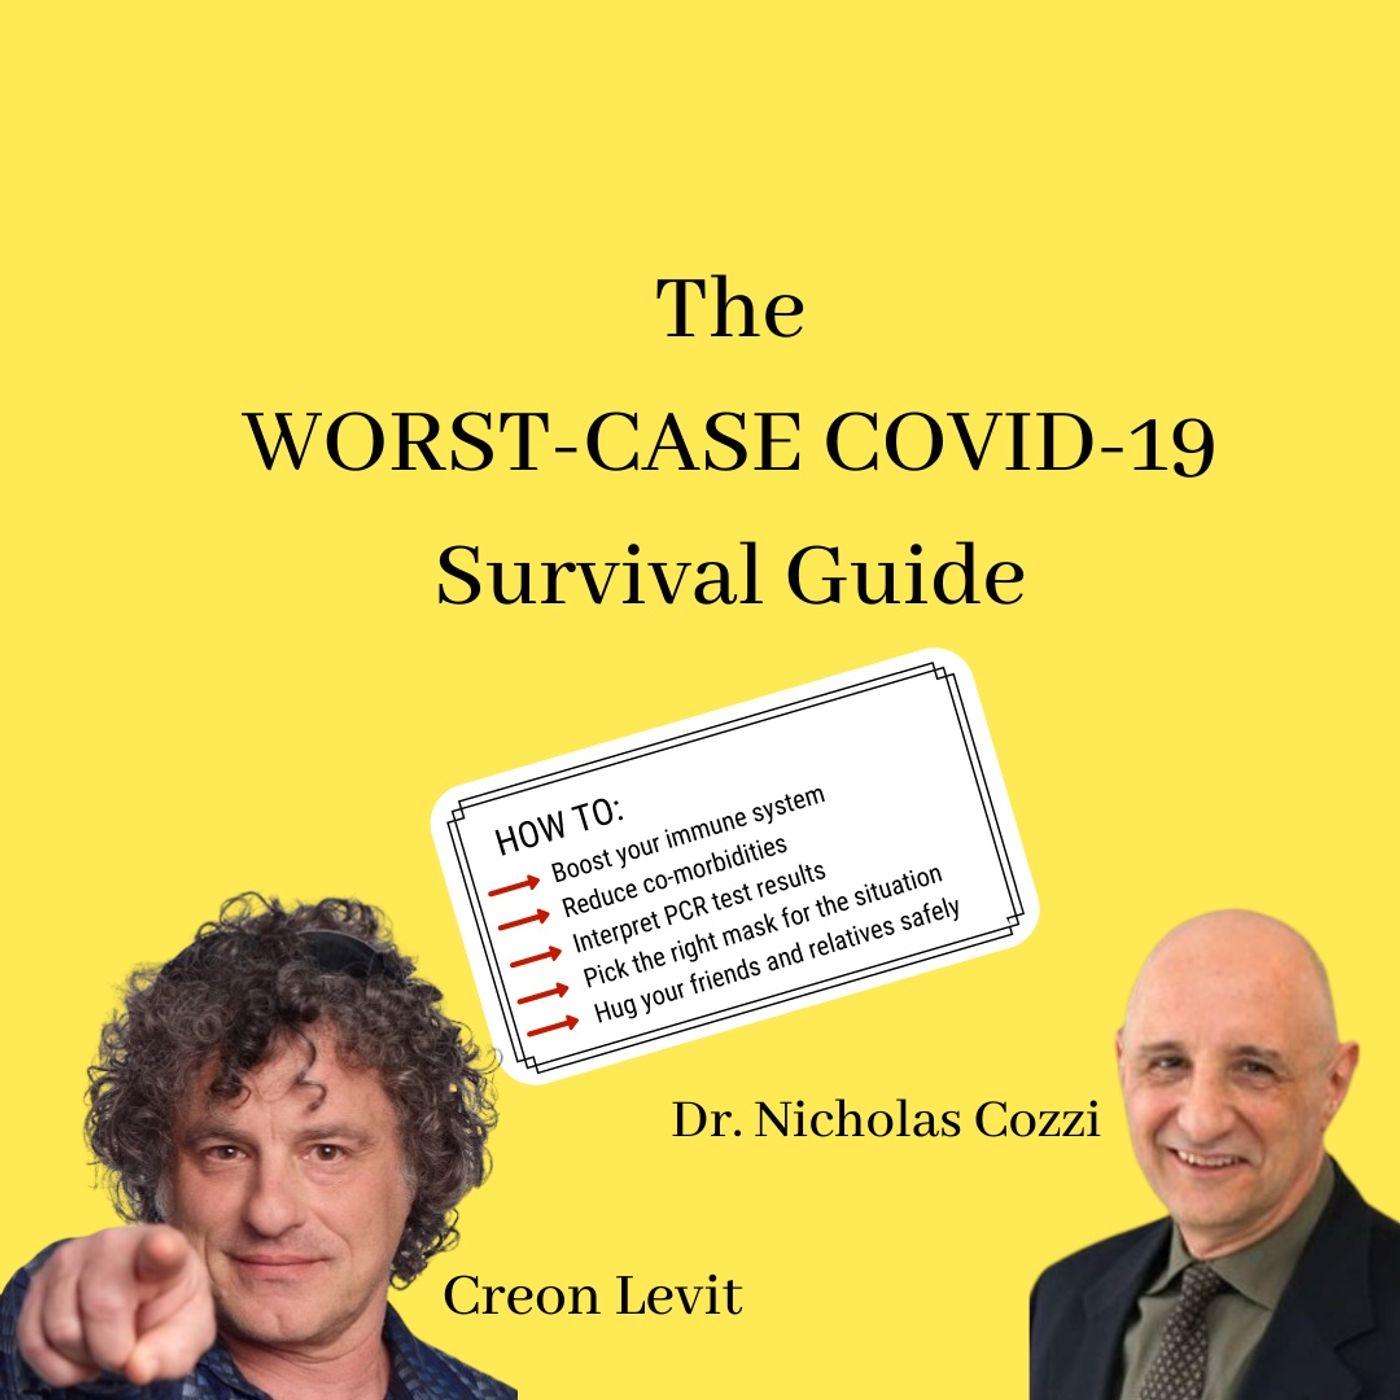 COVID Survivial Guide: The Scientists Speak